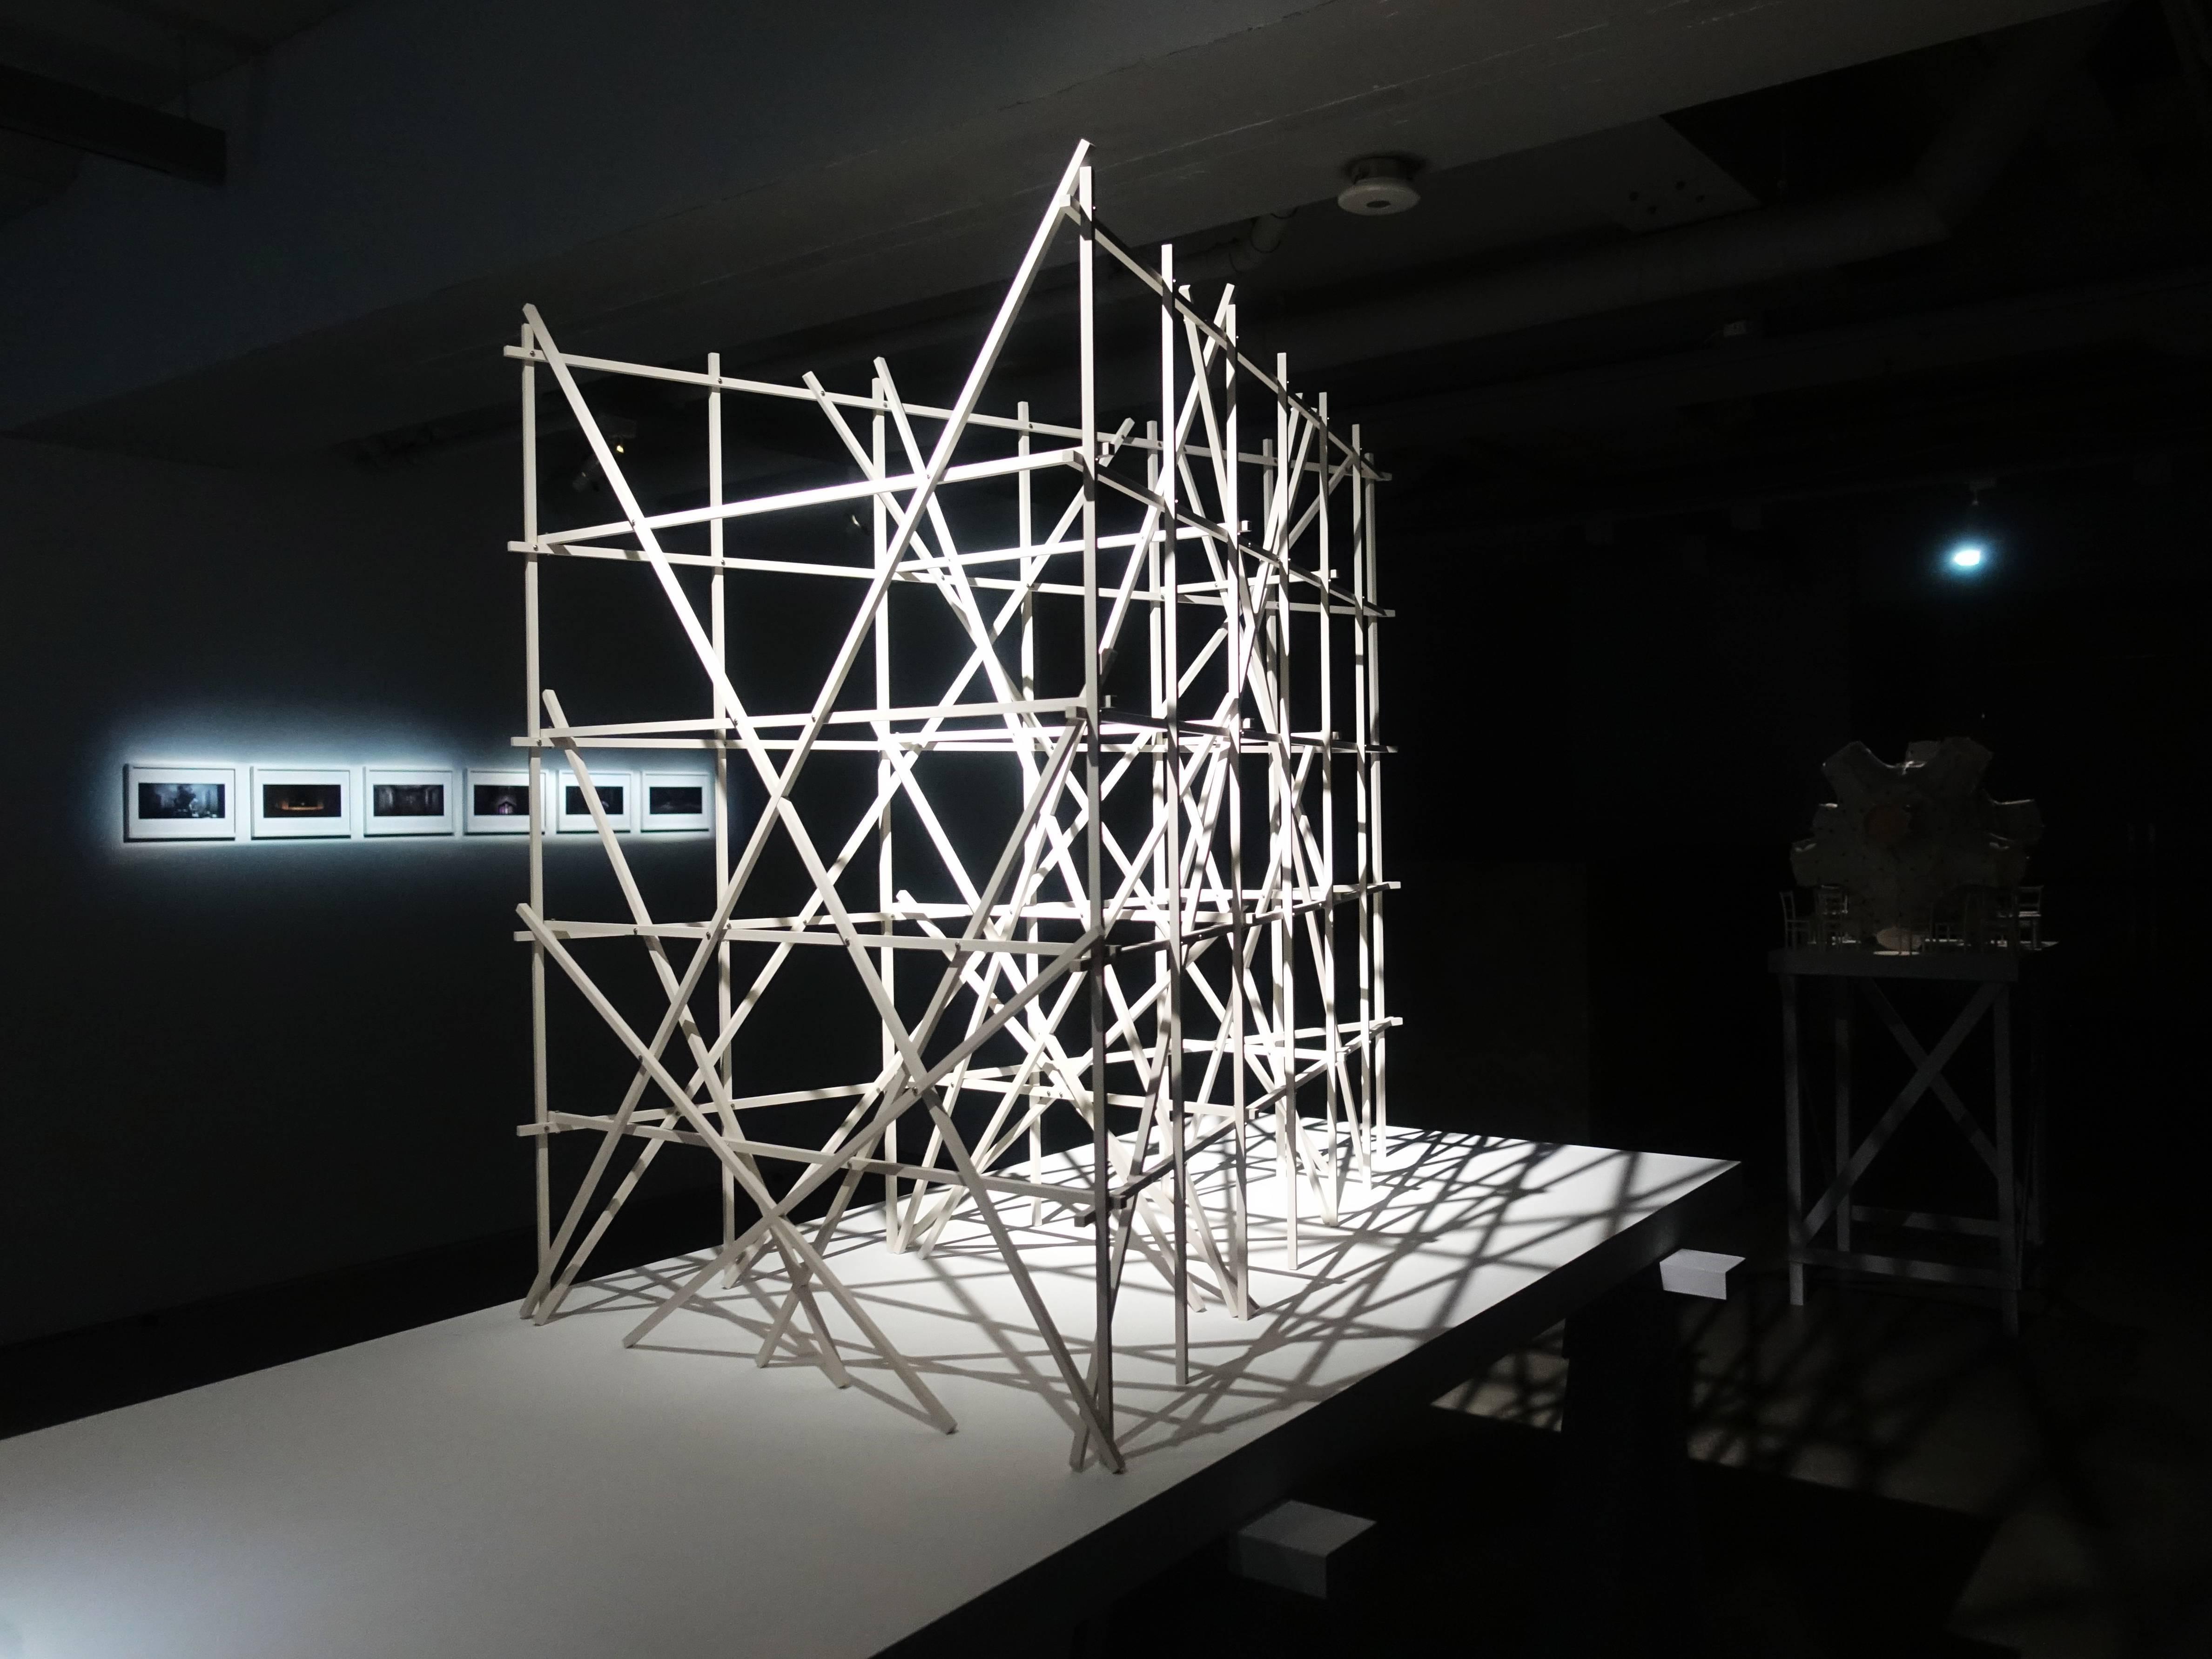 Florian Claar,《Fratres佛哈特爾》,106.5 x 125 x 78 cm,木頭、不鏽鋼螺栓,2019。